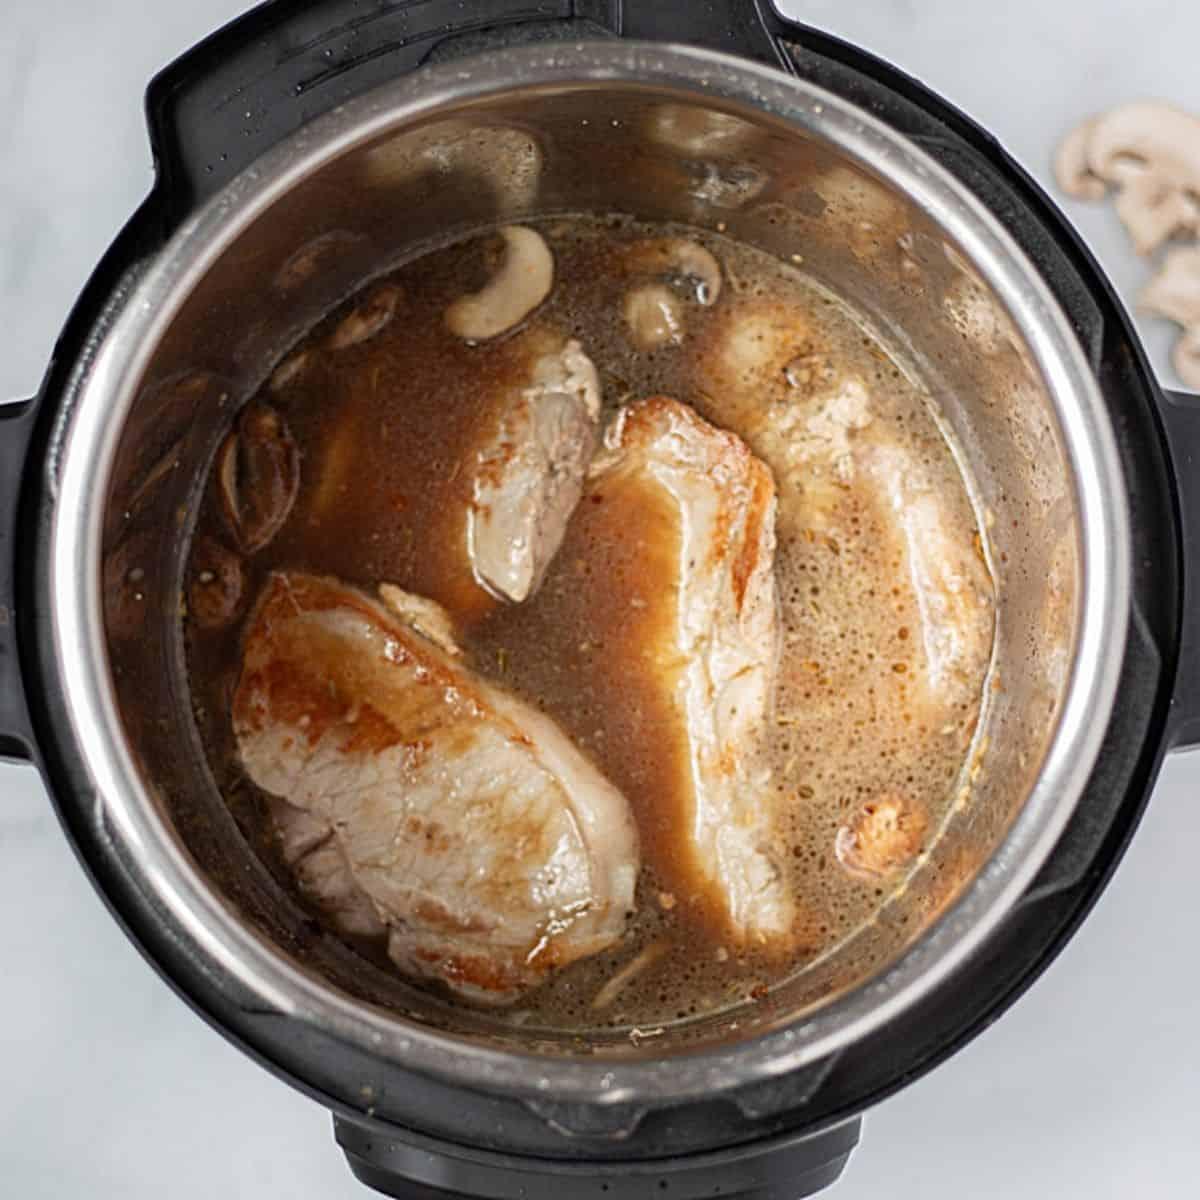 Pork chops and mushroom gravy in instant pot.